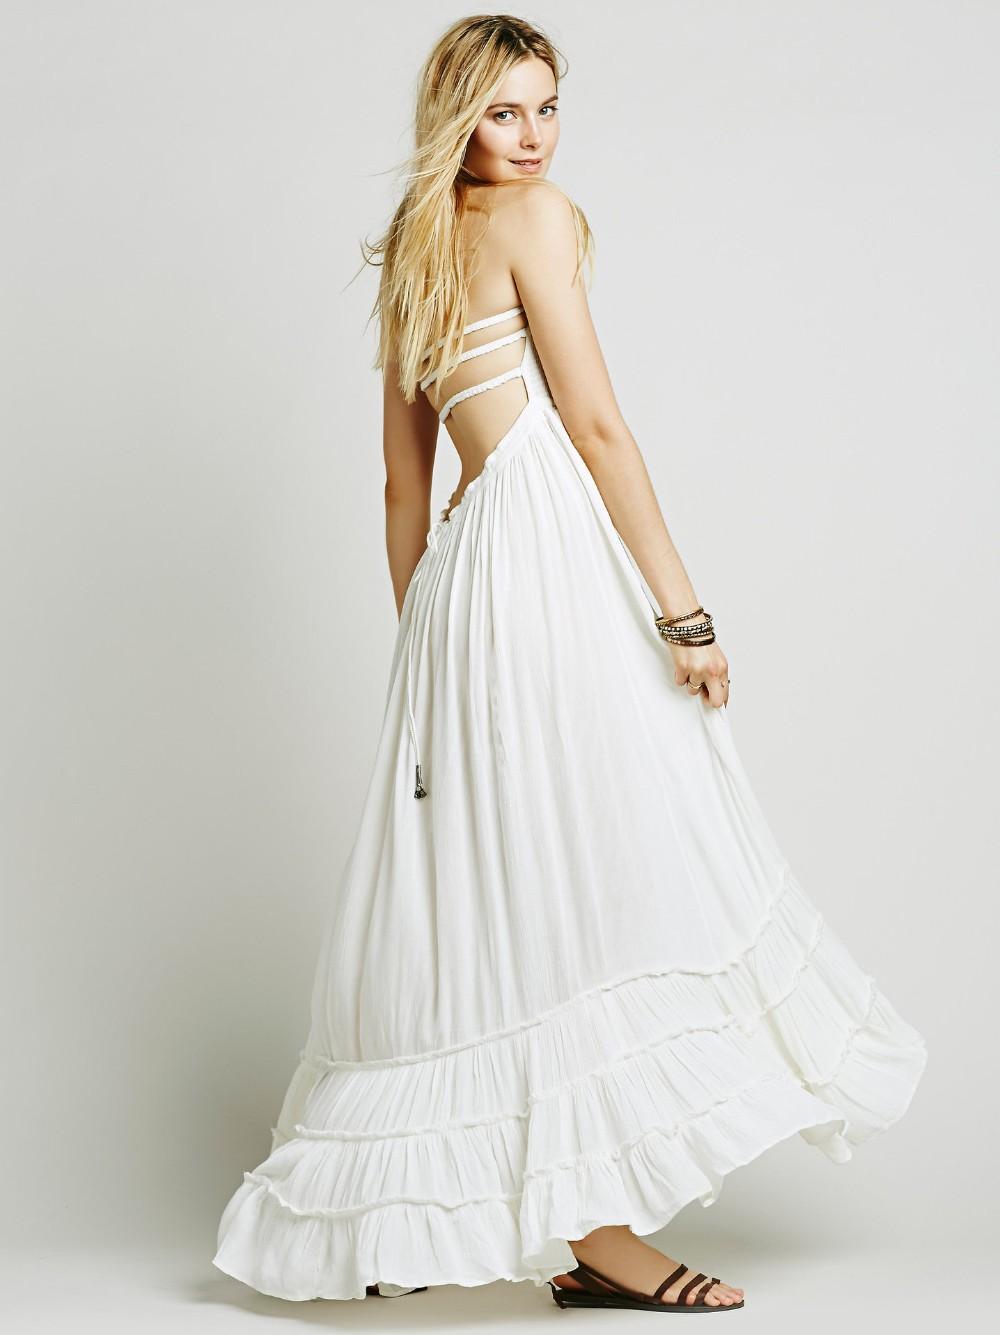 8fd3adcca08 Acheter Femmes Backless Beach Dress Bohème Casual Maxi Dress Été ...